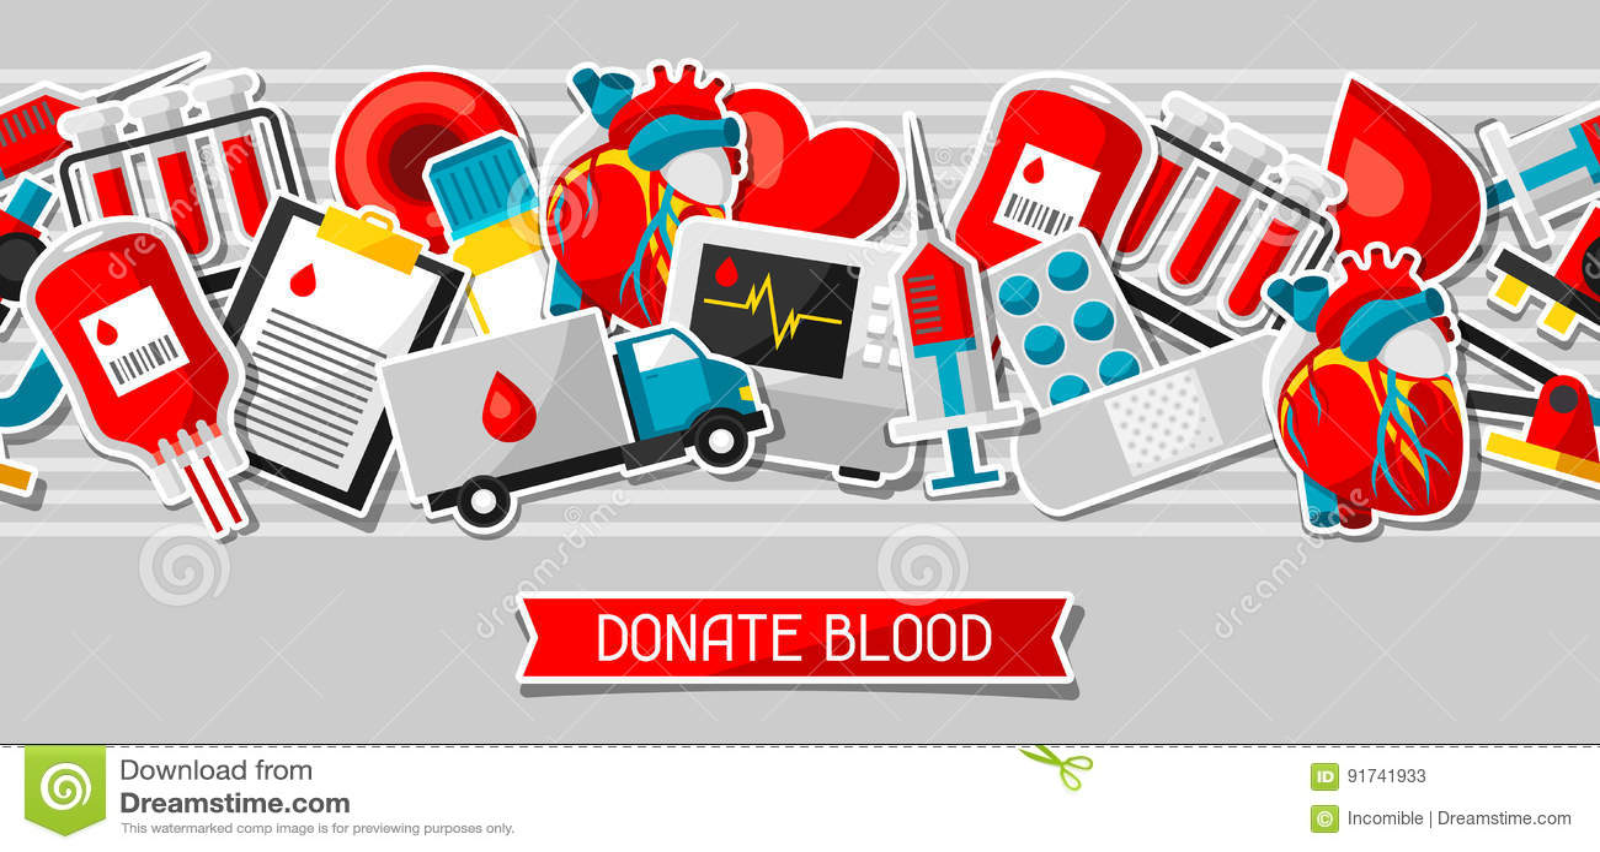 Organ Donation Cartoons